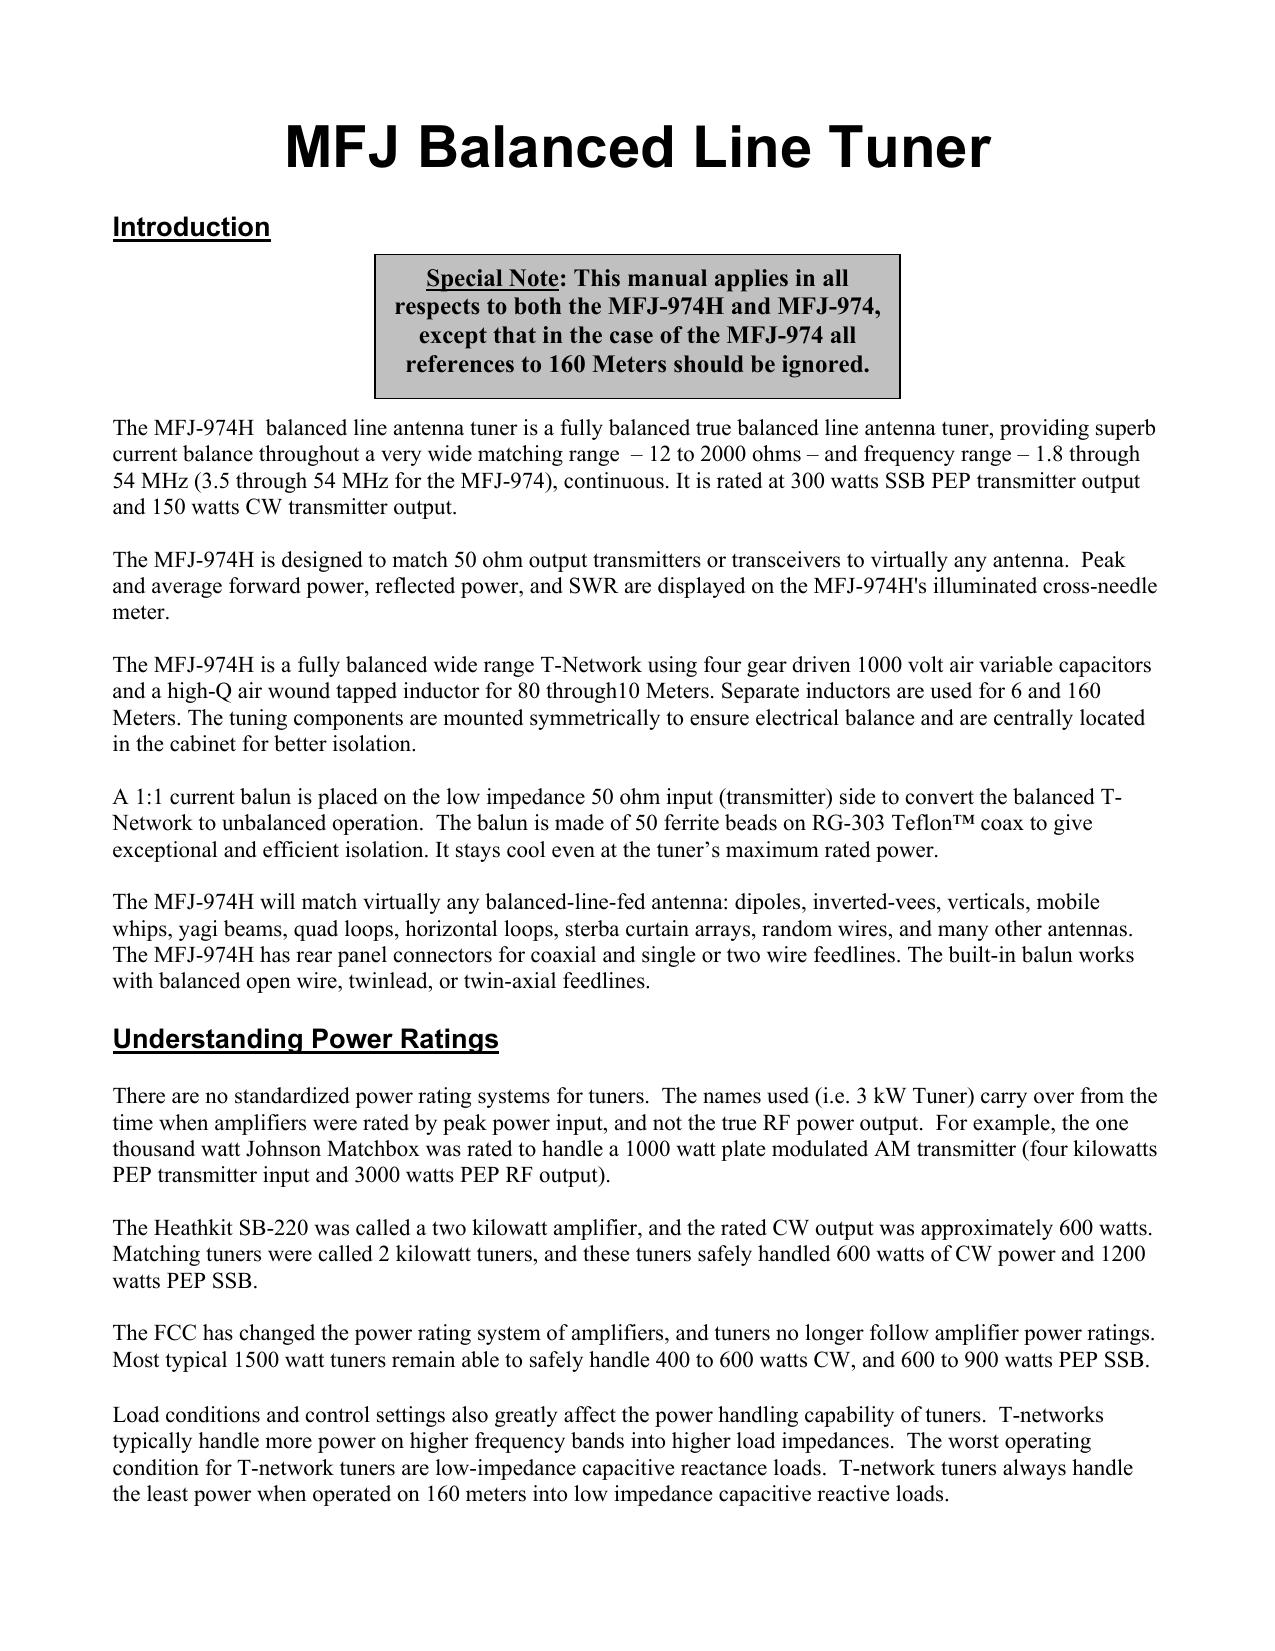 MFJ Balanced Line Tuner | manualzz com